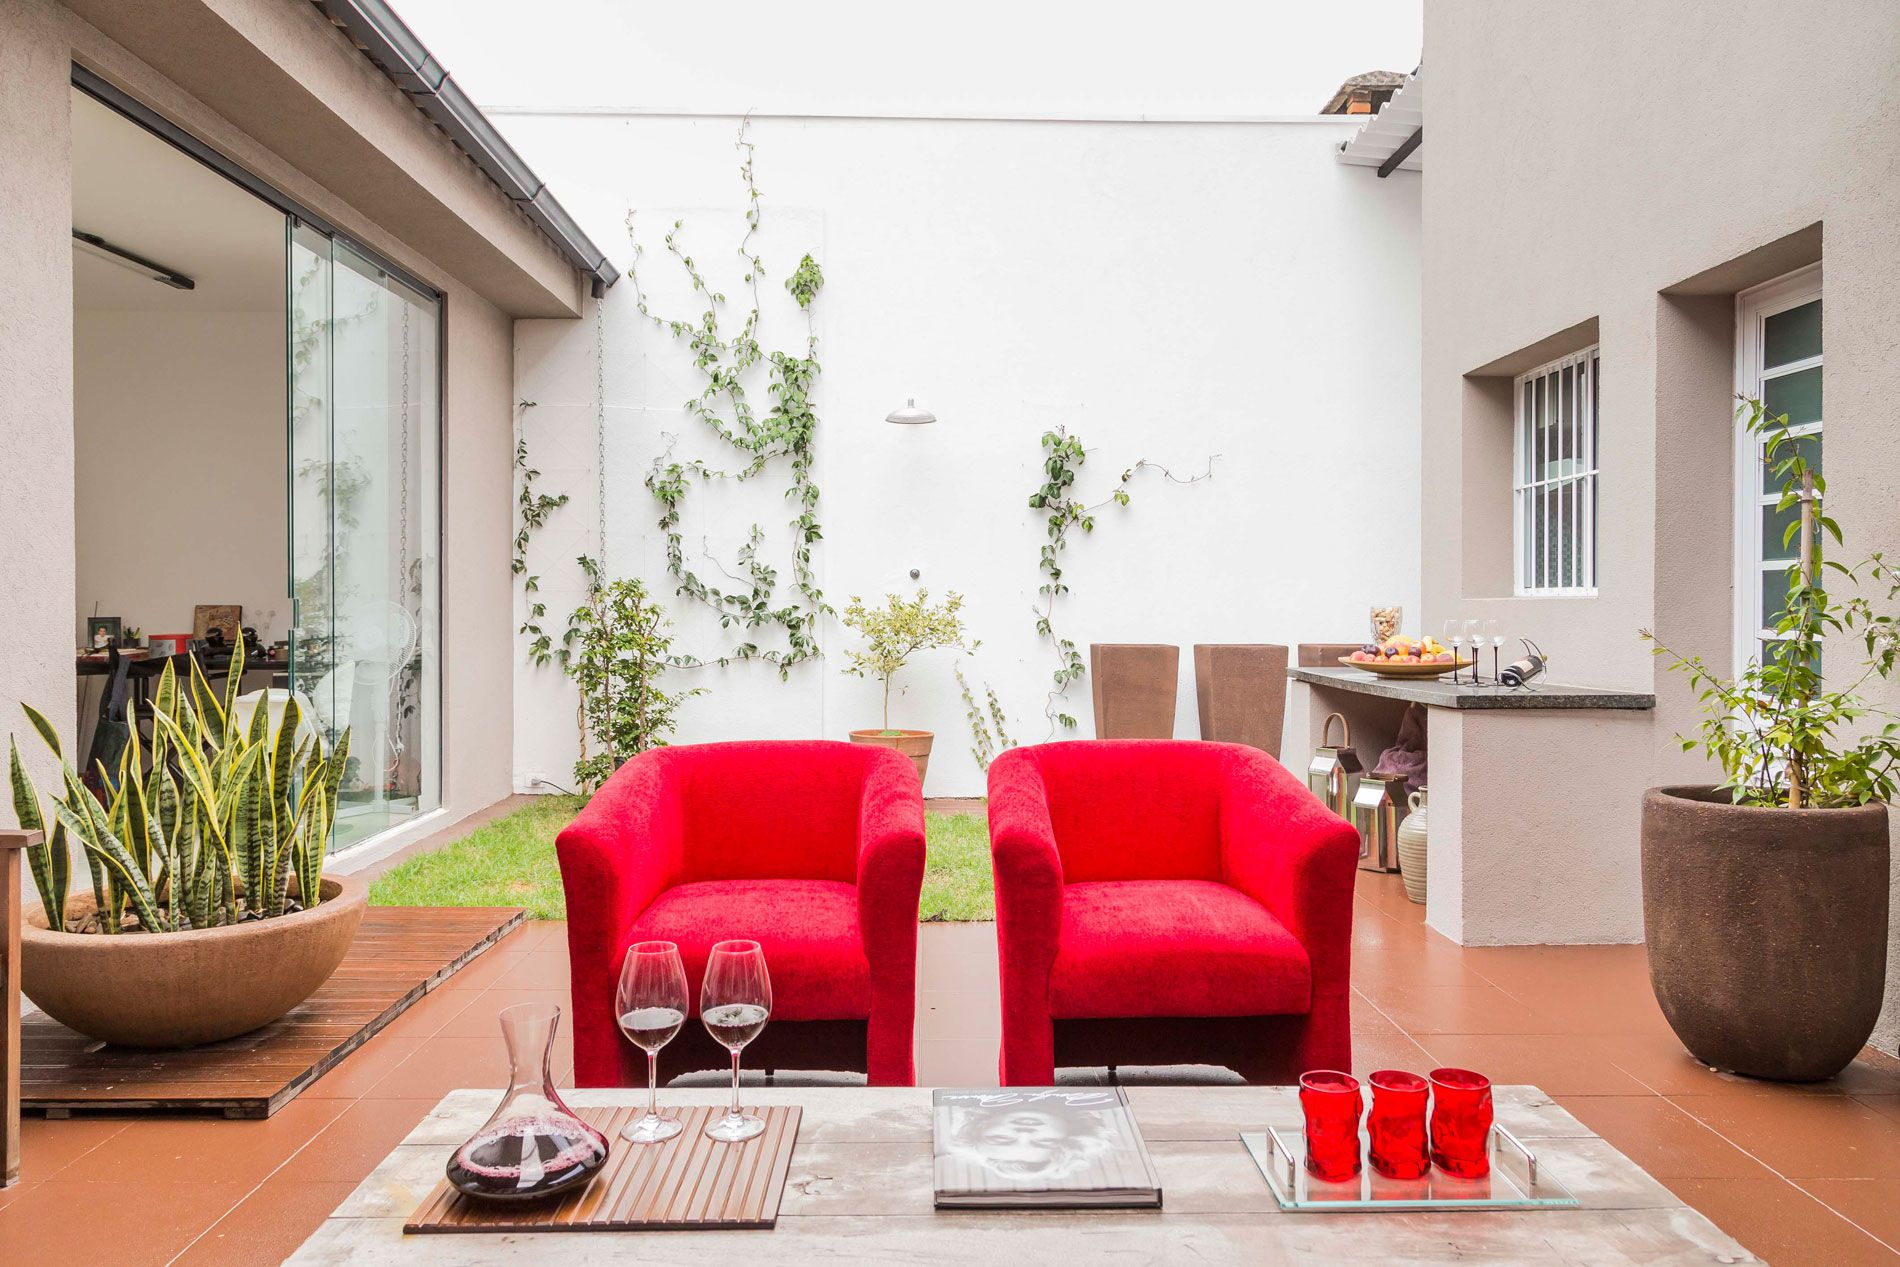 Granja-Julieta-Residence-05